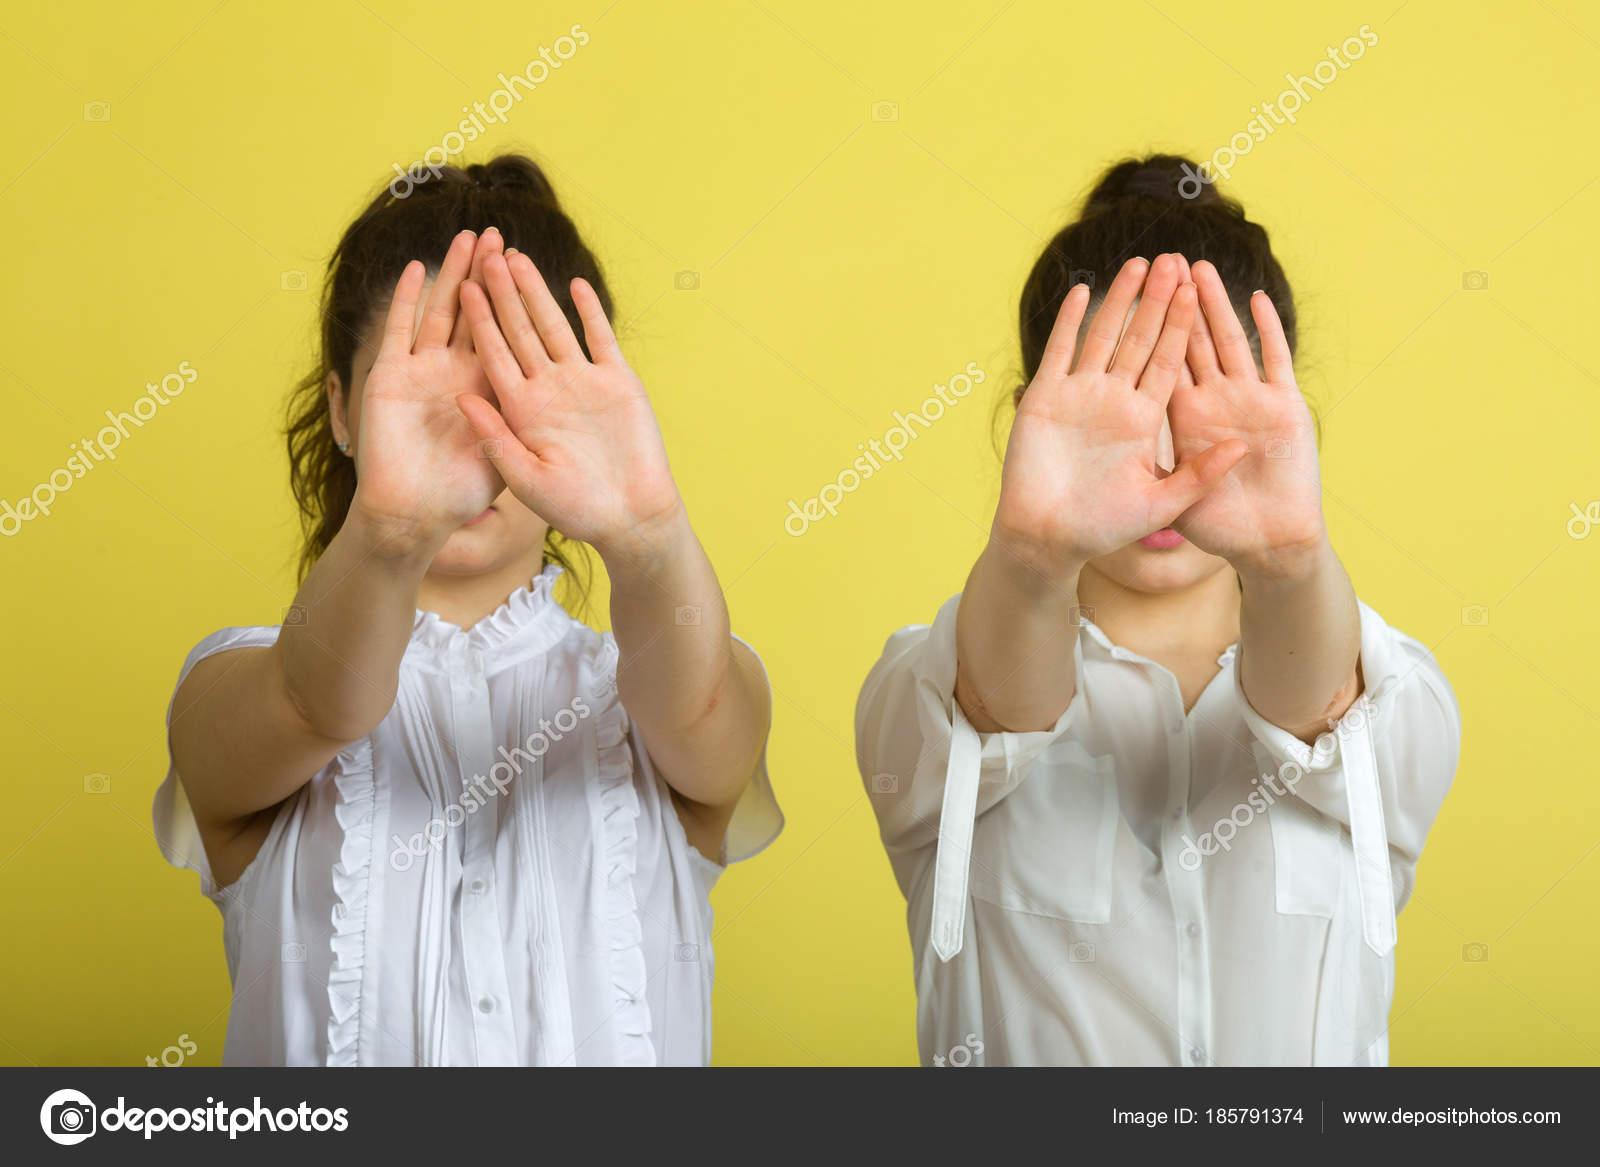 97581988d18f Δύο δίδυμα αδελφές όμορφη νεαρή κοπέλα σε λευκό μπλούζες σε κίτρινο φόντο  με σοβαρά αντιμετωπίζει και των κινήσεων των χεριών — Εικόνα από ...